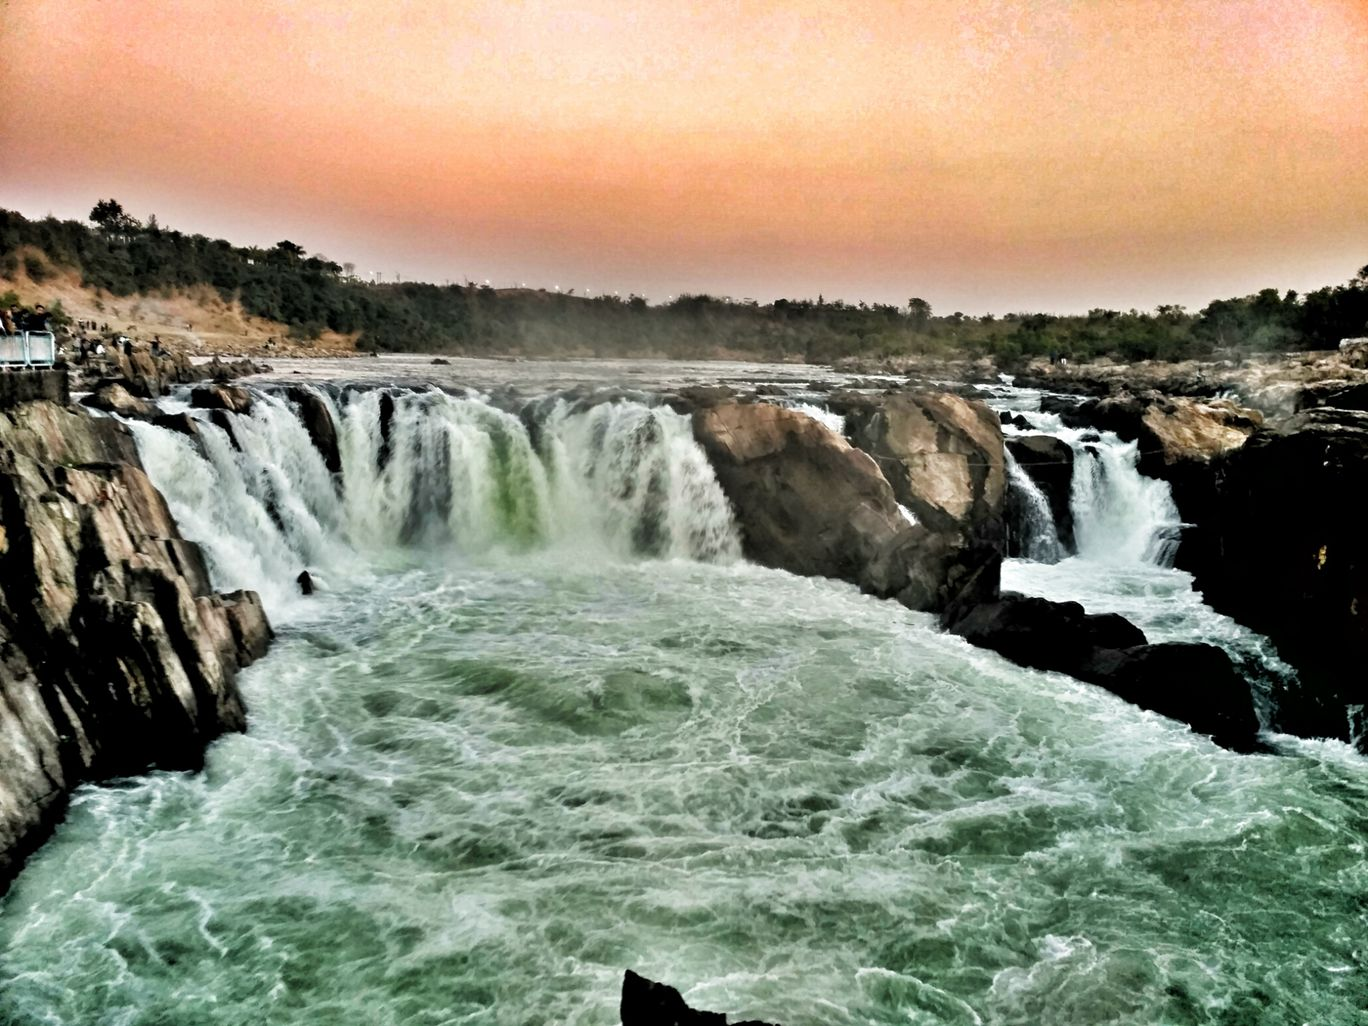 Photo of Dhuandhar Water Fall By Shubham Jain